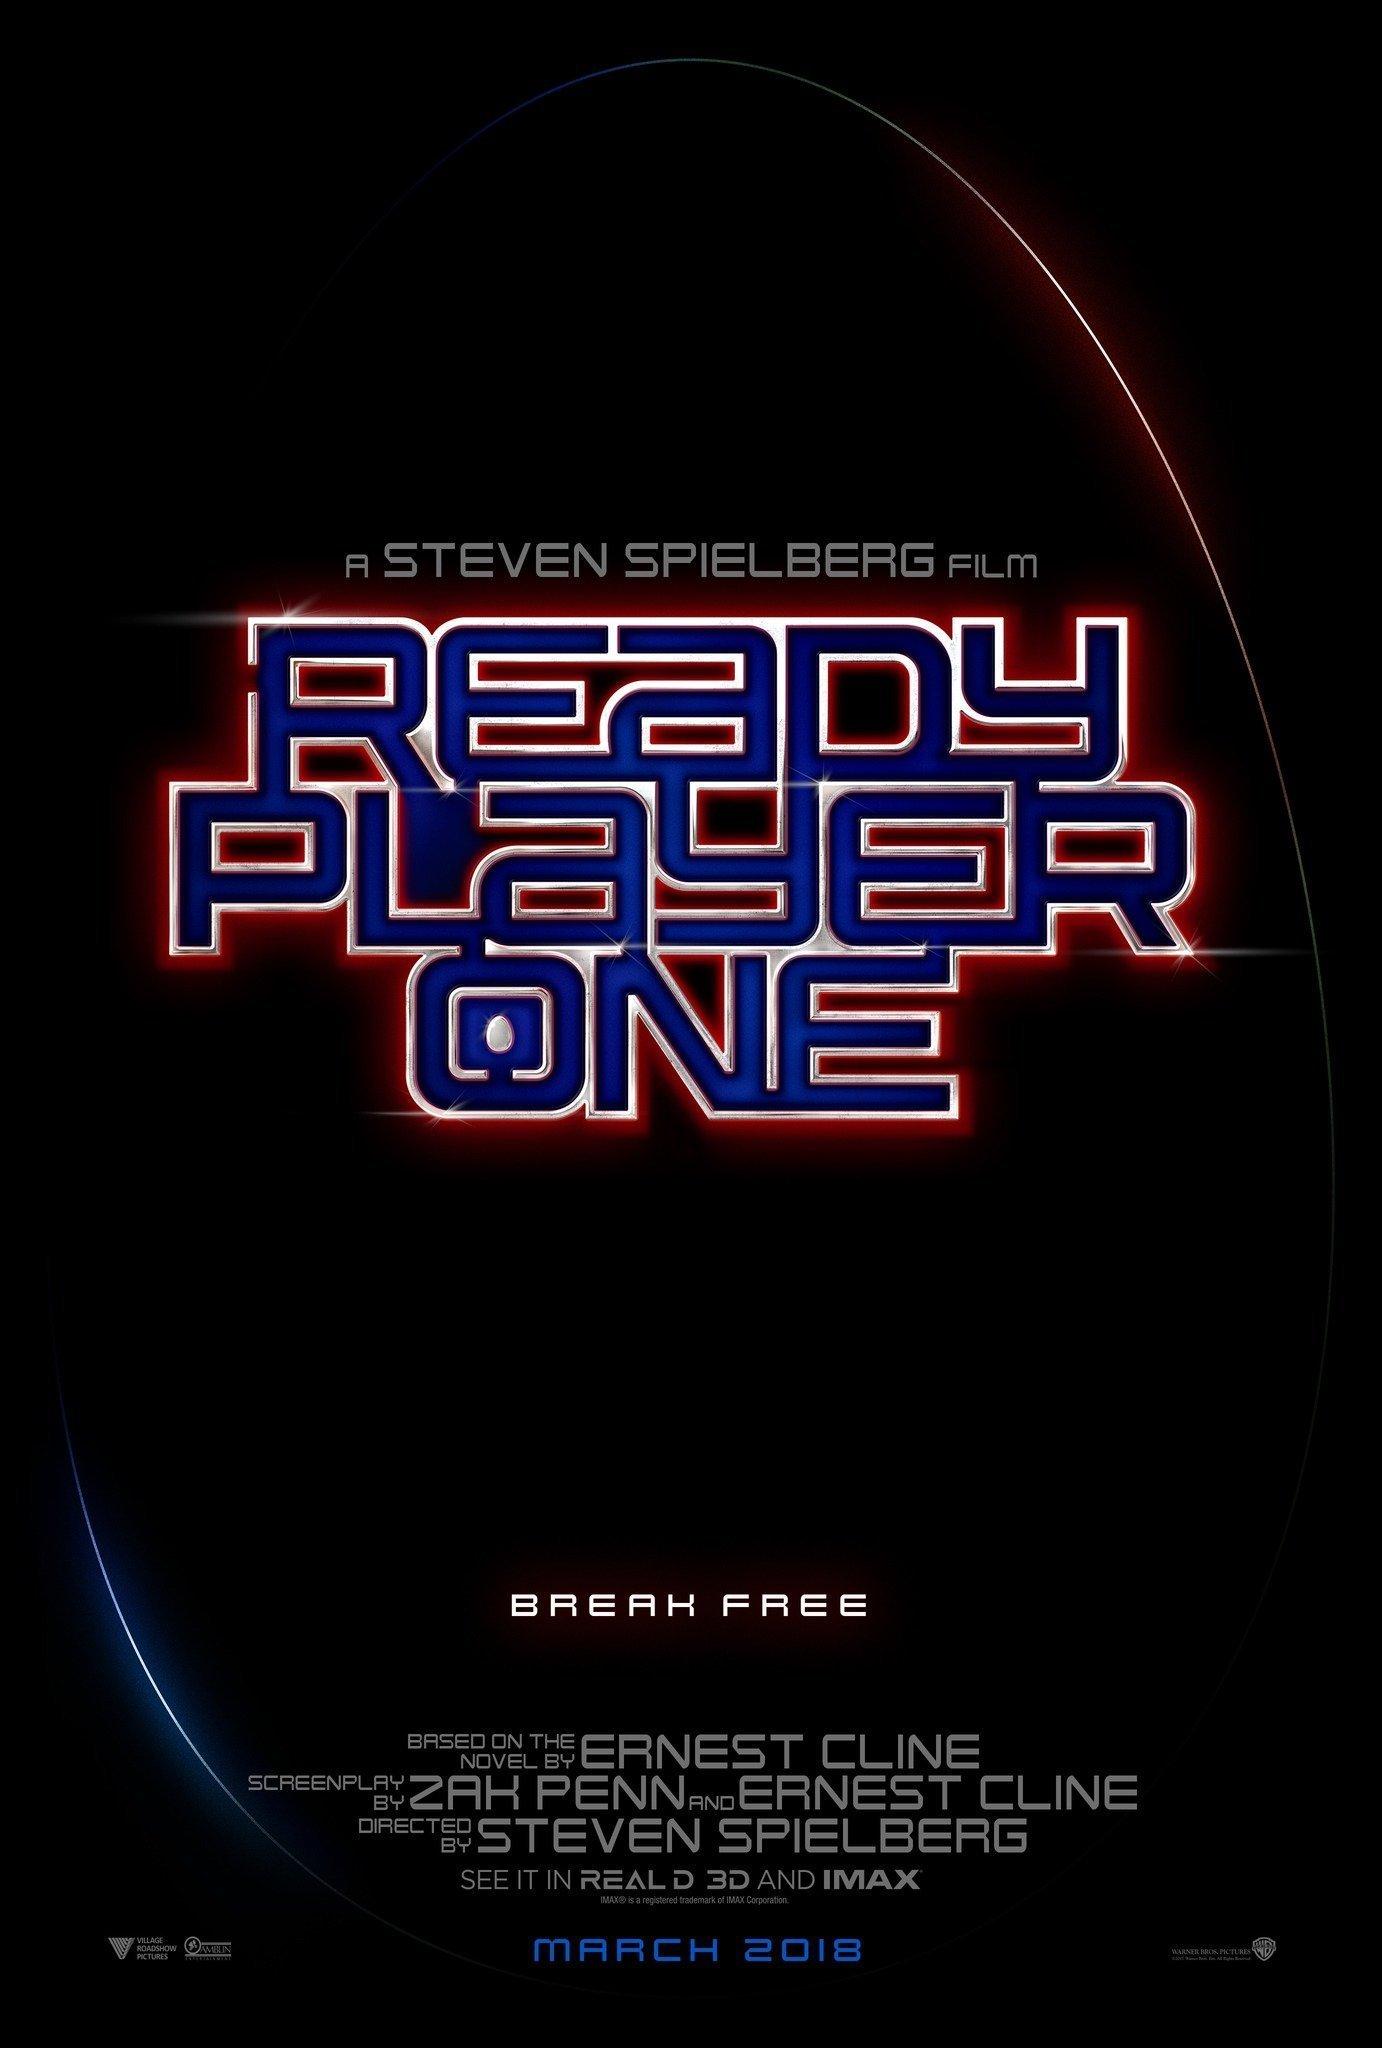 Poster teaser du film Ready Player One montrant le logo